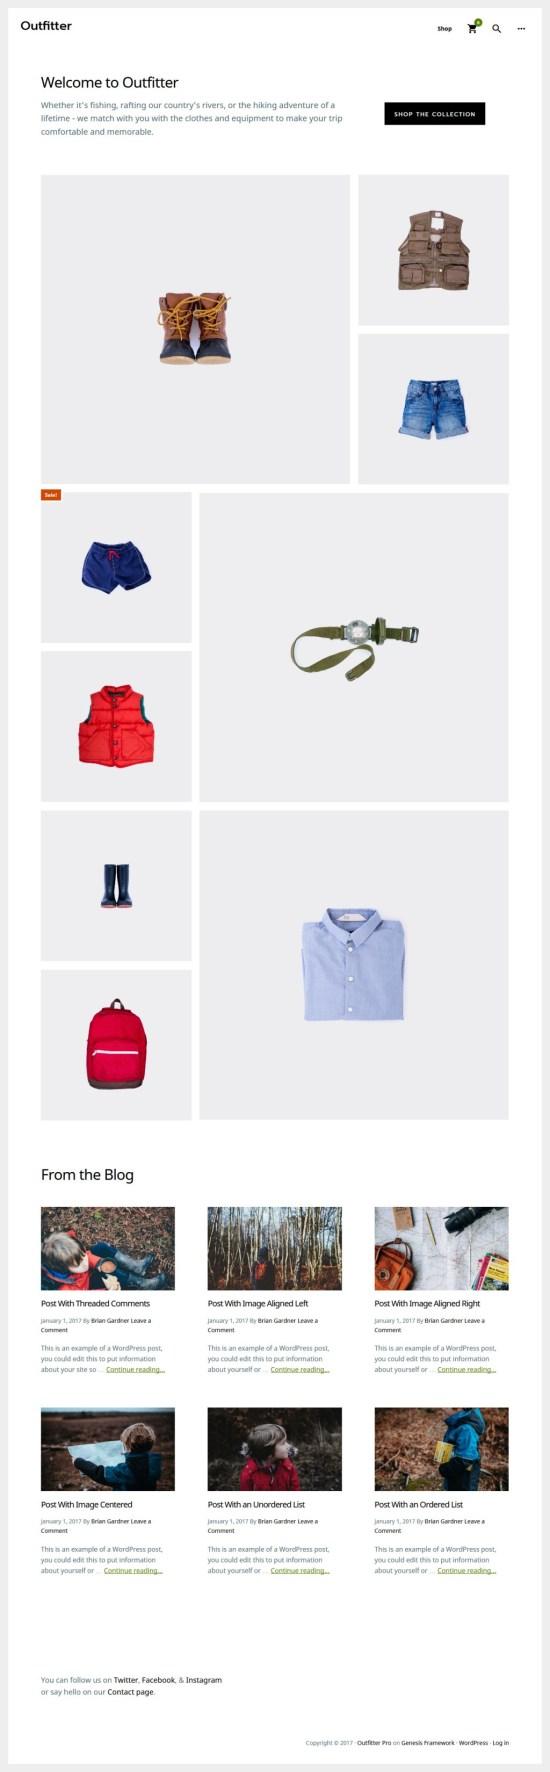 outfitter studiopress genesis storefront theme 01 - Outfitter Pro WordPress Theme